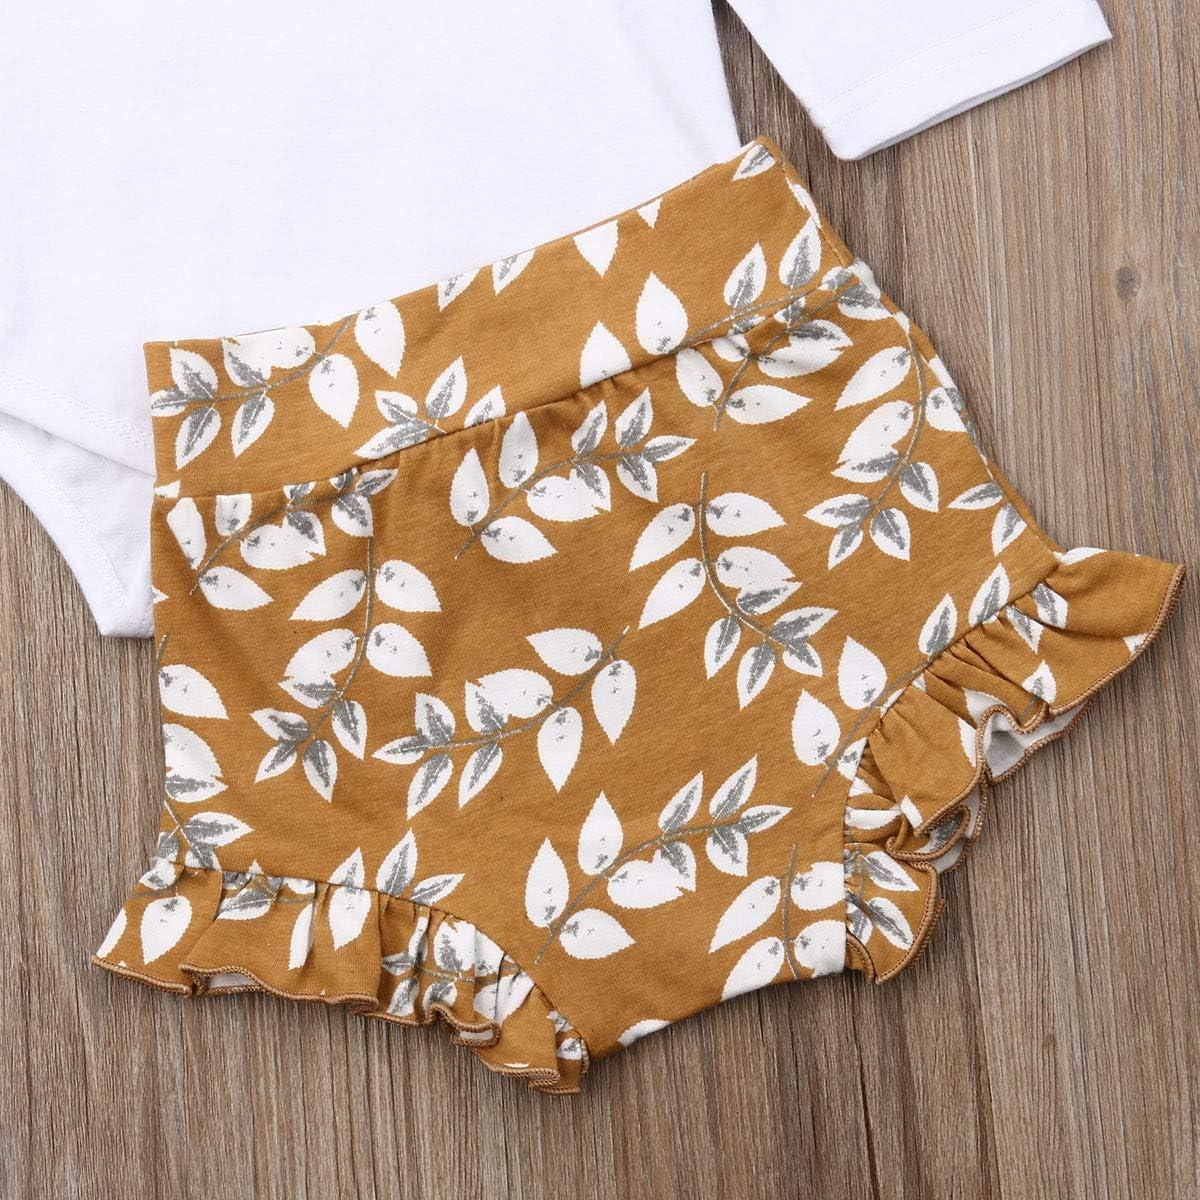 Newborn Infant Baby Girls Black Short//Long Sleeve Romper Top Leopard Print Ruffled Shorts Pants Headband 3Pcs Outfit